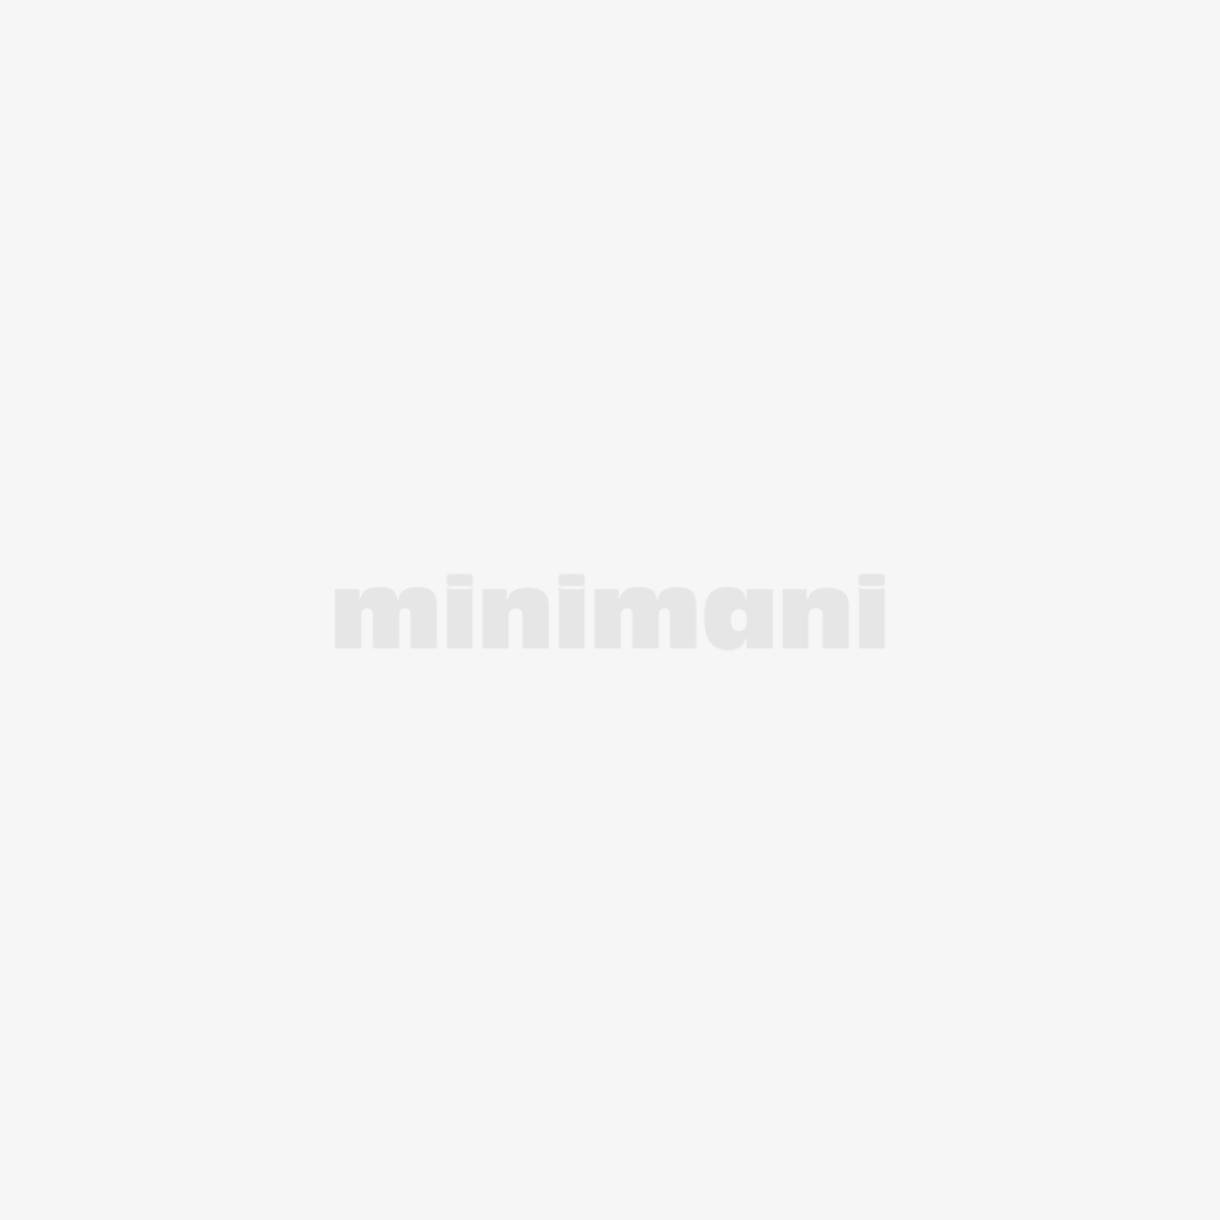 4LIVING TABLETTI MATILDA BASIC